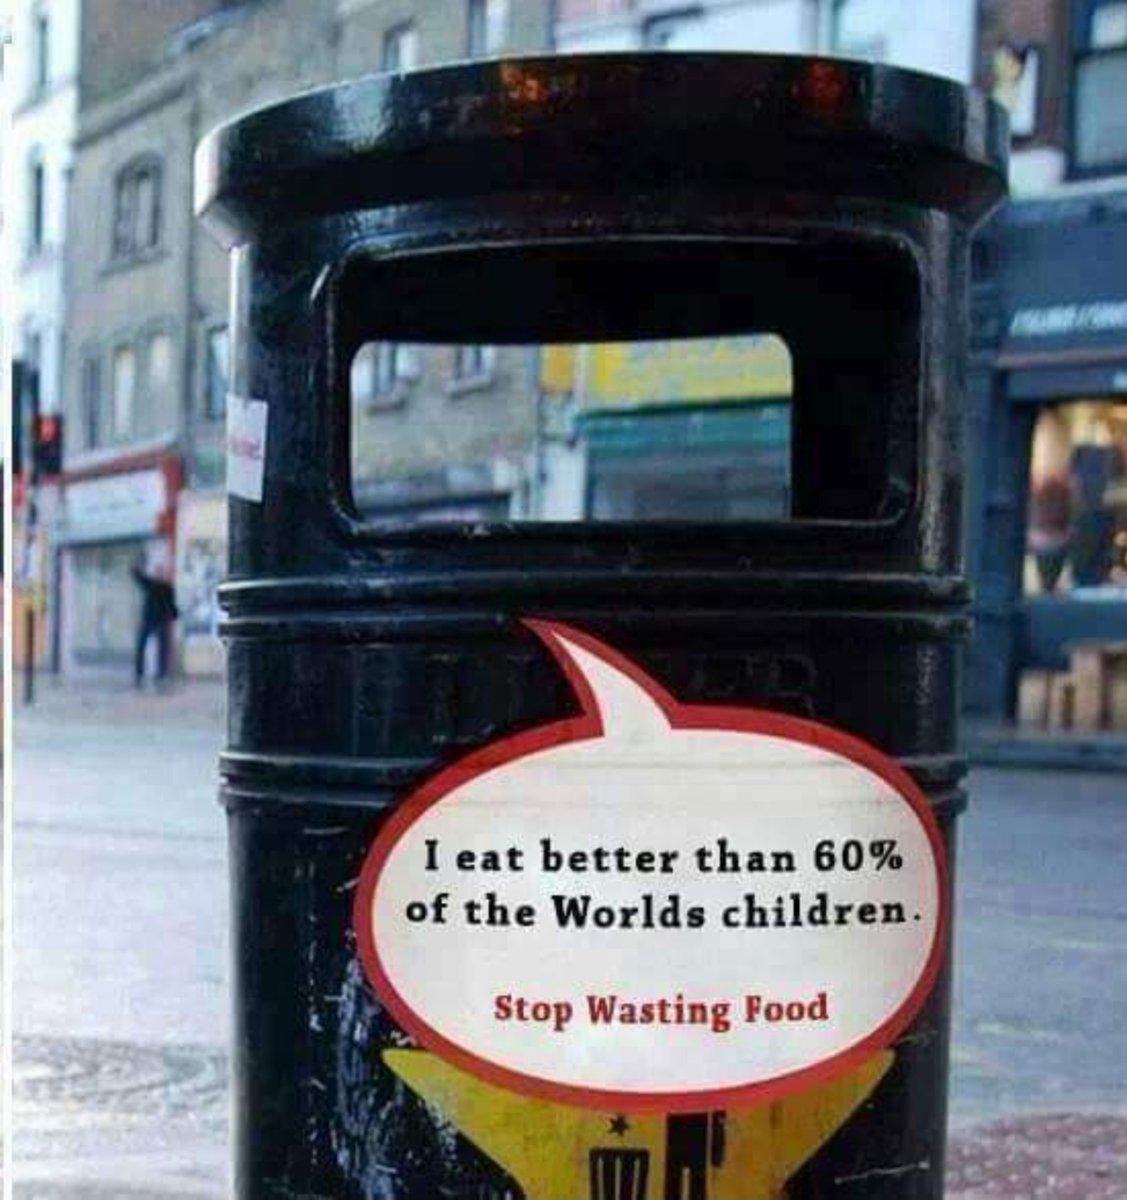 This deserves endless Retweets. #RT #RETWEEET #LA #LosAngeles bKQTldhRji